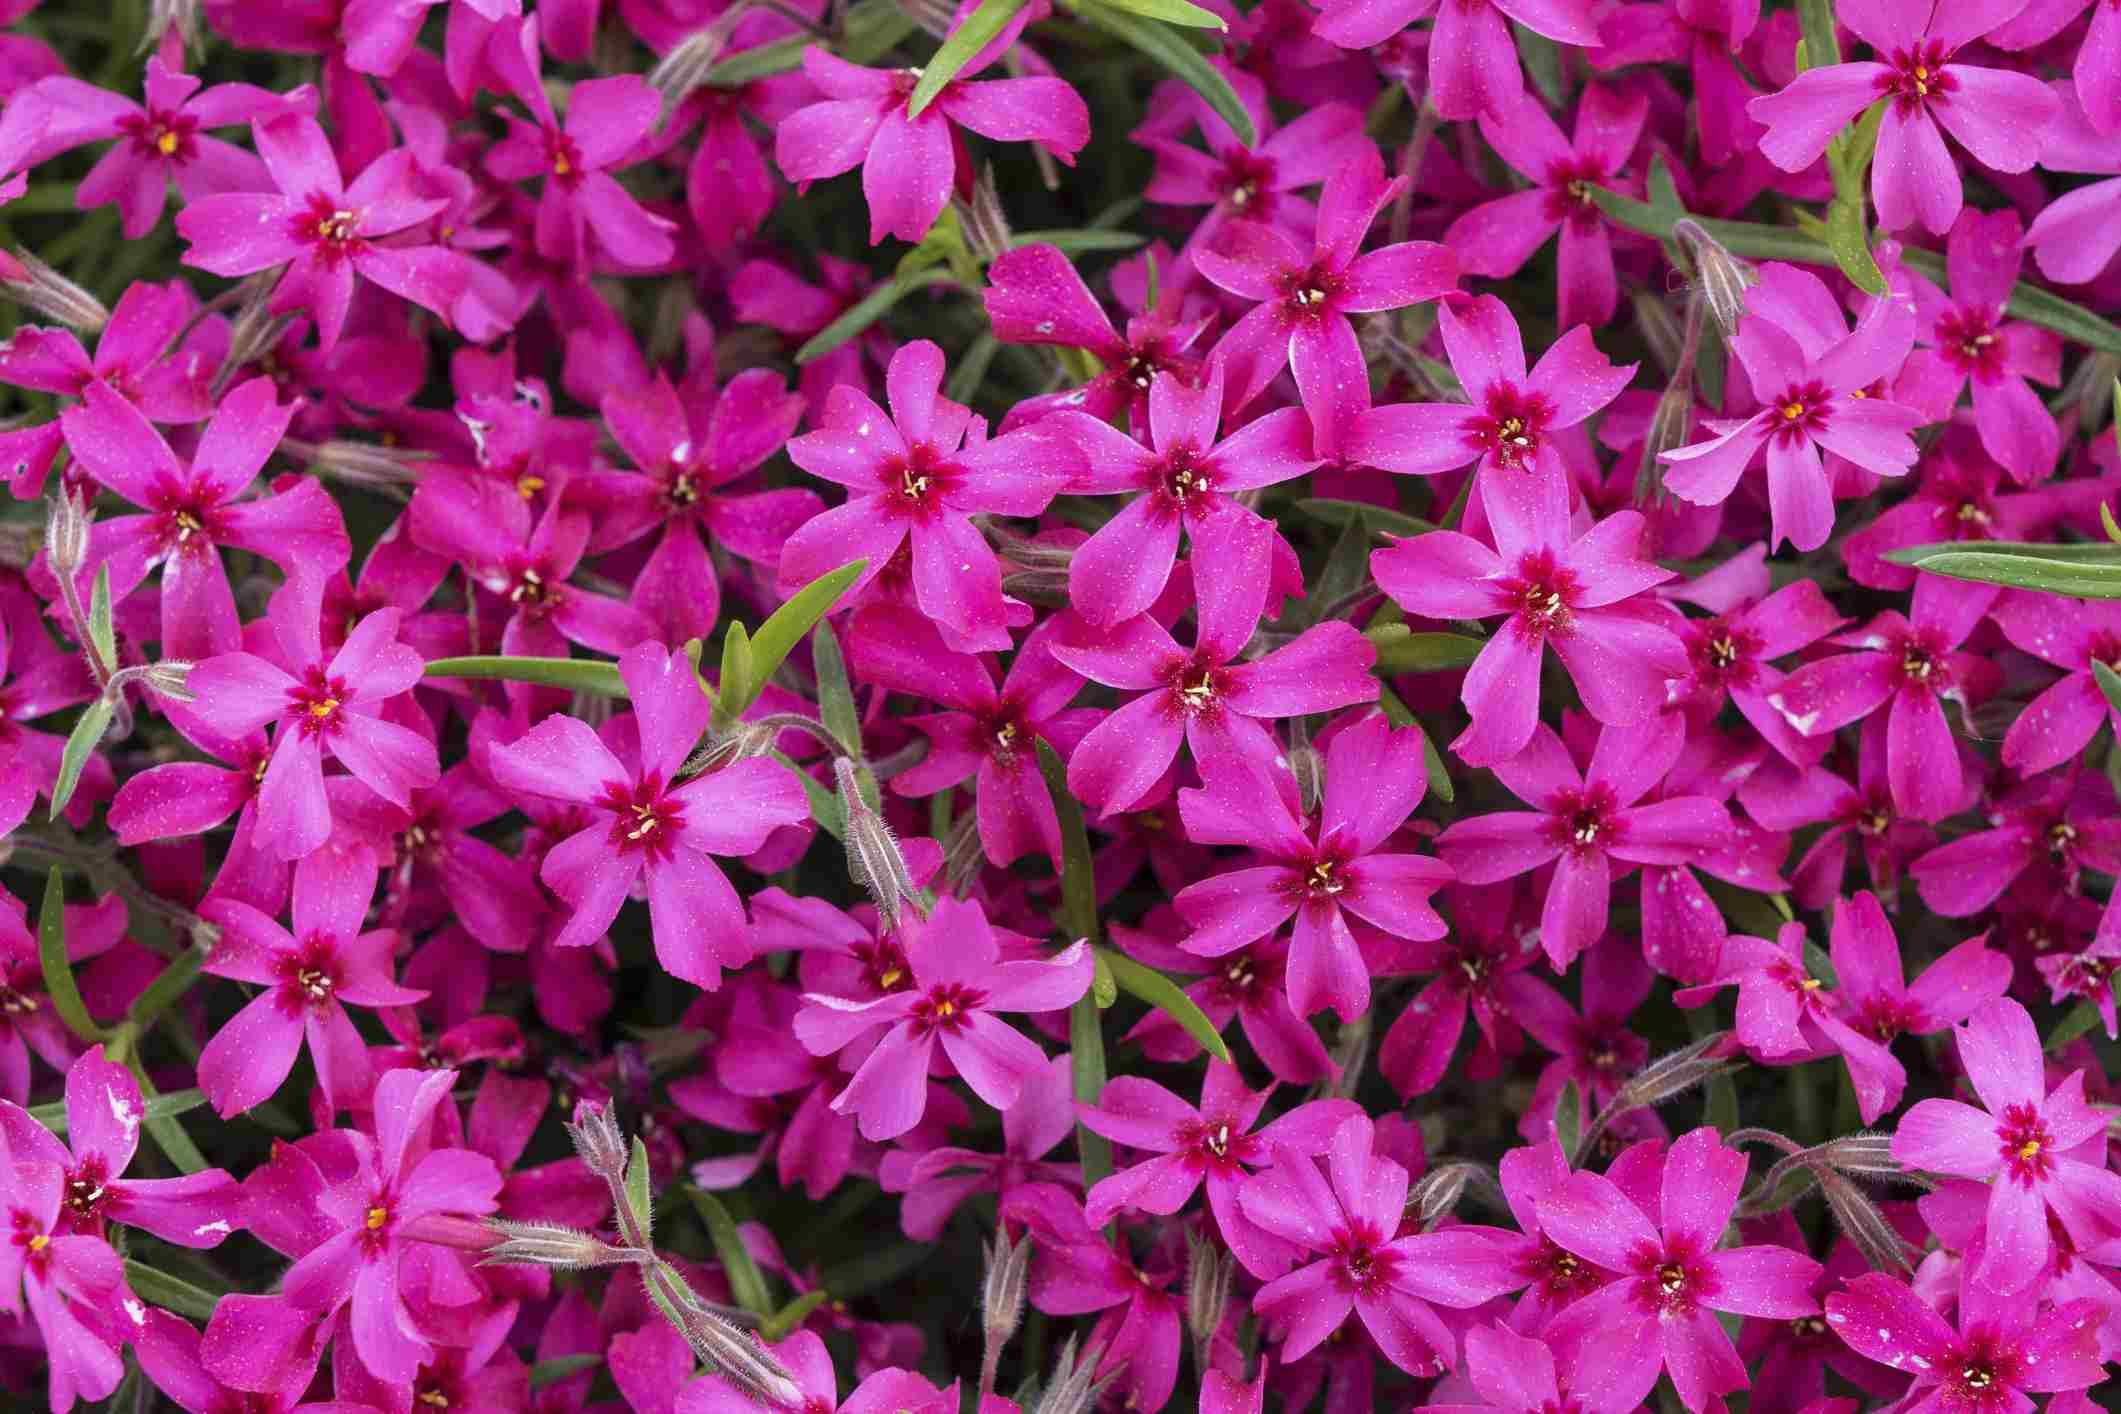 Creeping phlox flowers in hot pink.